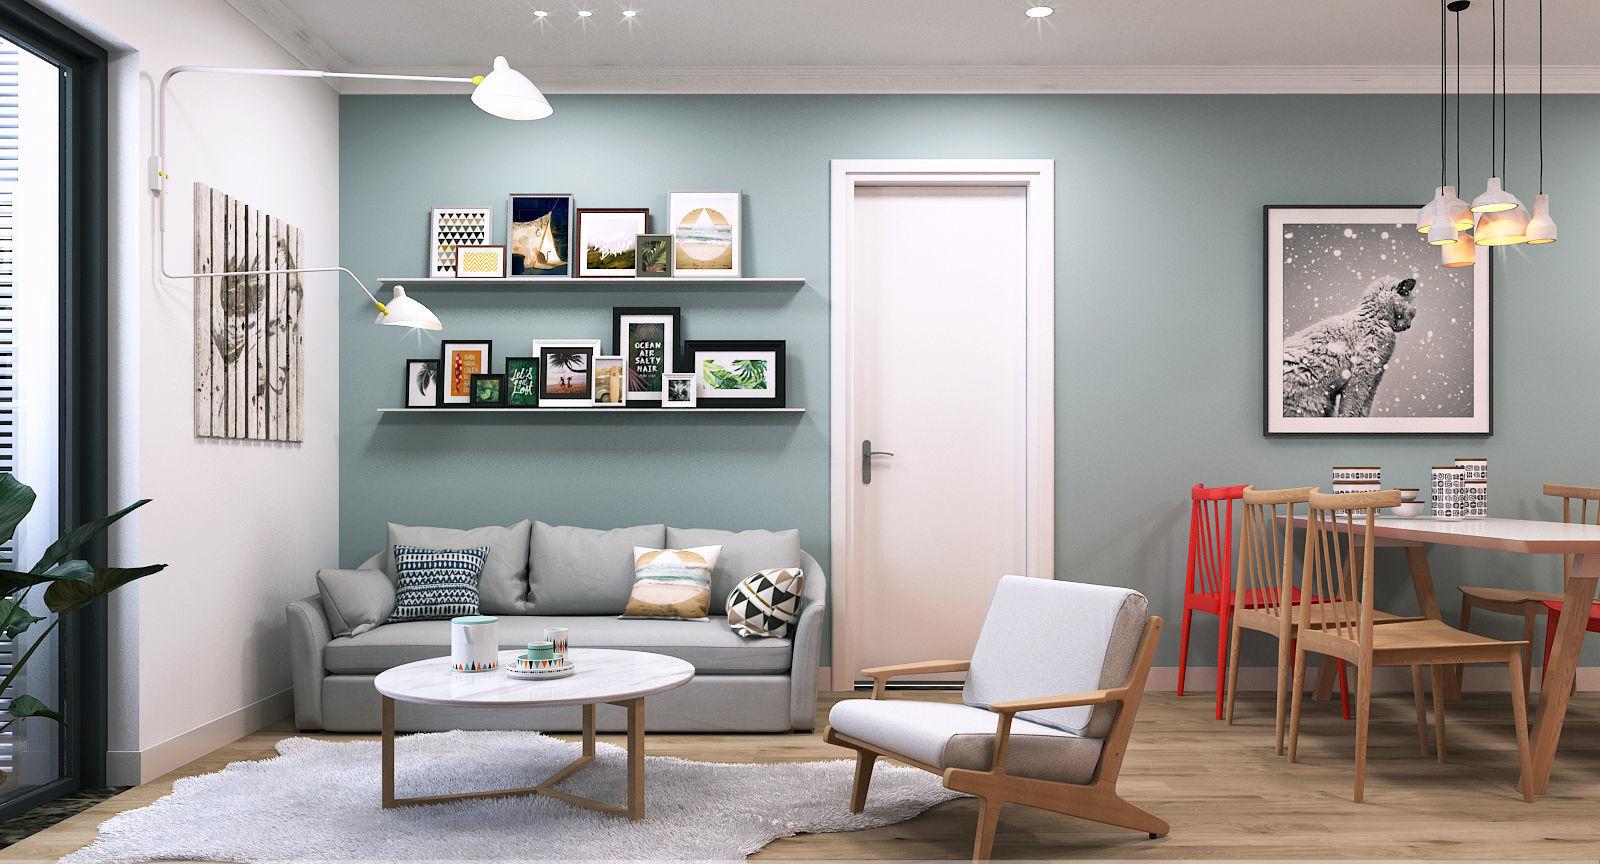 apartment livingroom simple 5b0f7943 d0fe 4ac8 83f4 d8fd0a985aee